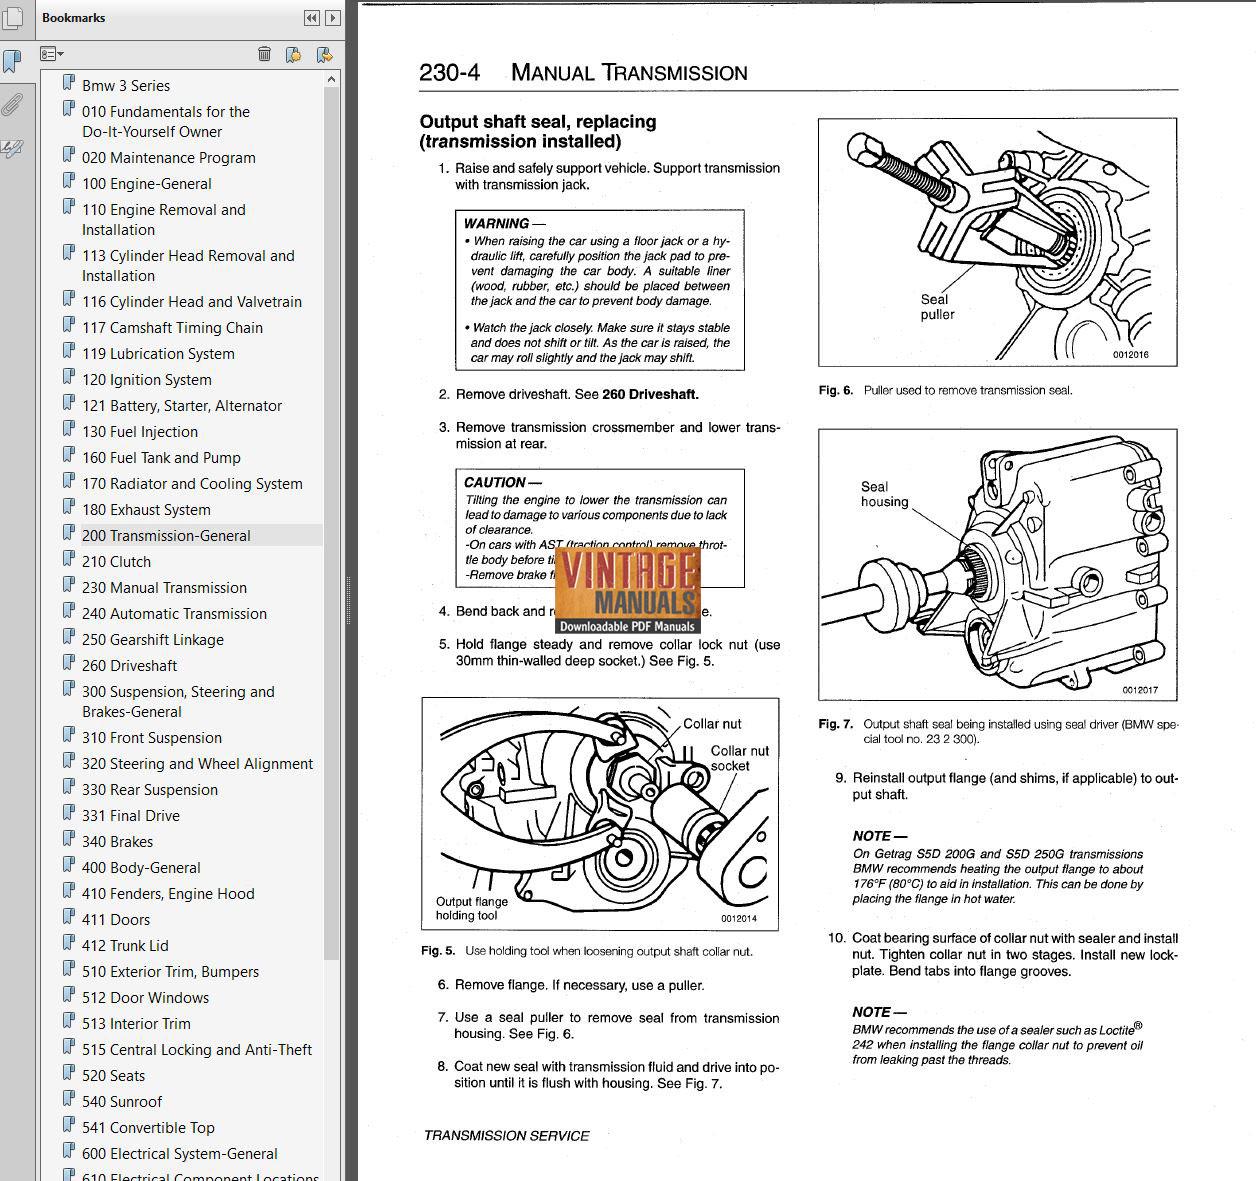 1992 1998 bmw 318 323 328 m3 e36 service manual vintagemanuals rh vintagemanuals net bmw e36 repair manual bmw e36 repair manual free download